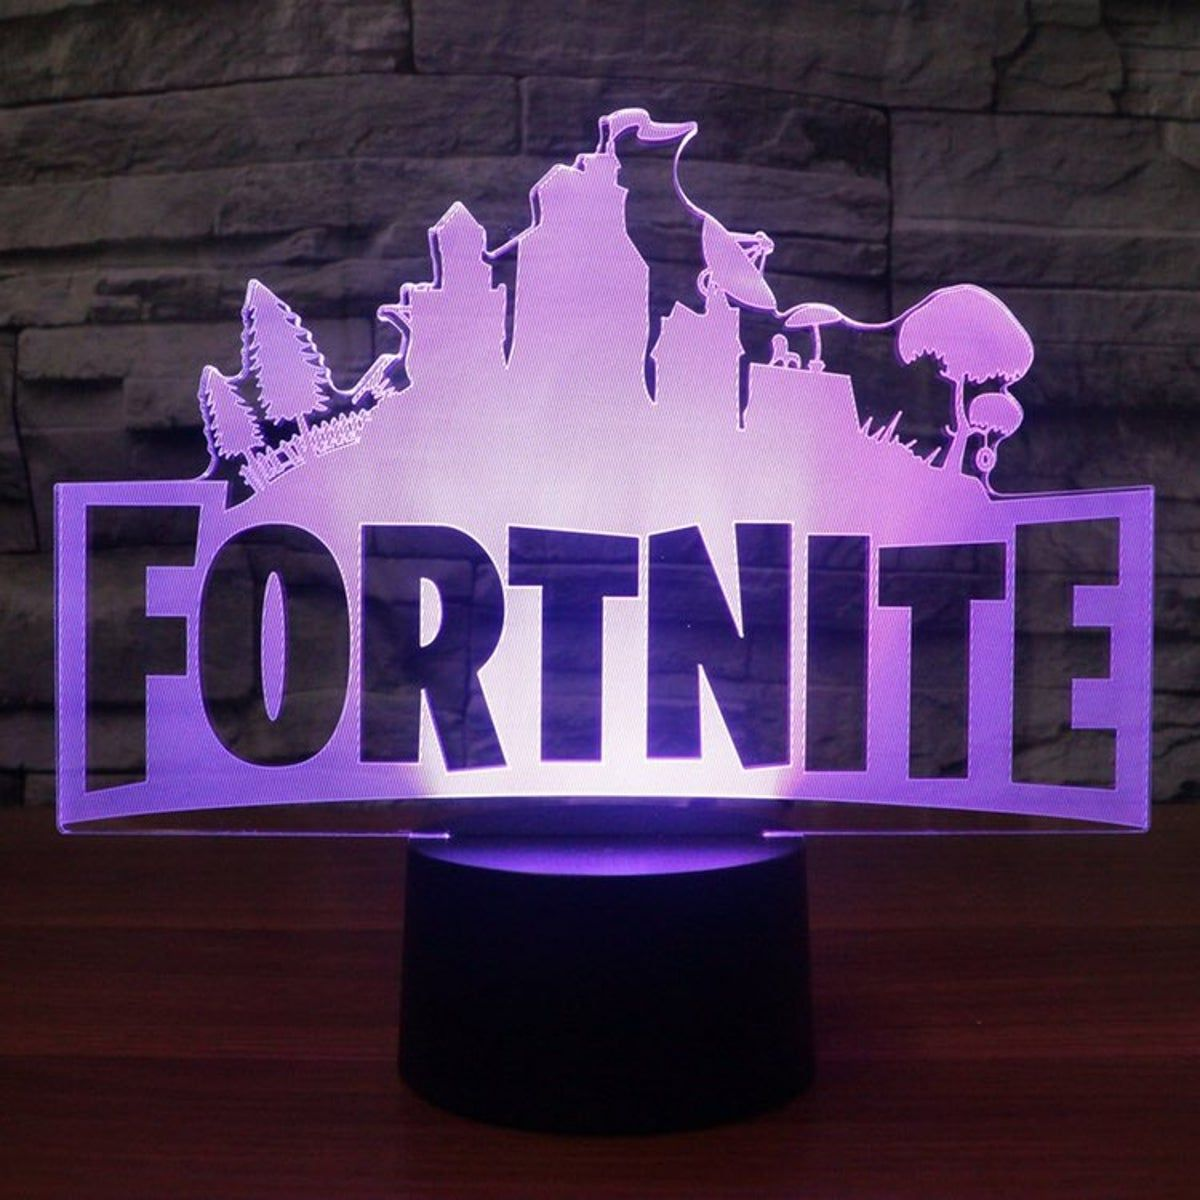 Fortnite 3d Lamp In 2020 Game Room Kids Led Night Light Boy Bedroom Design